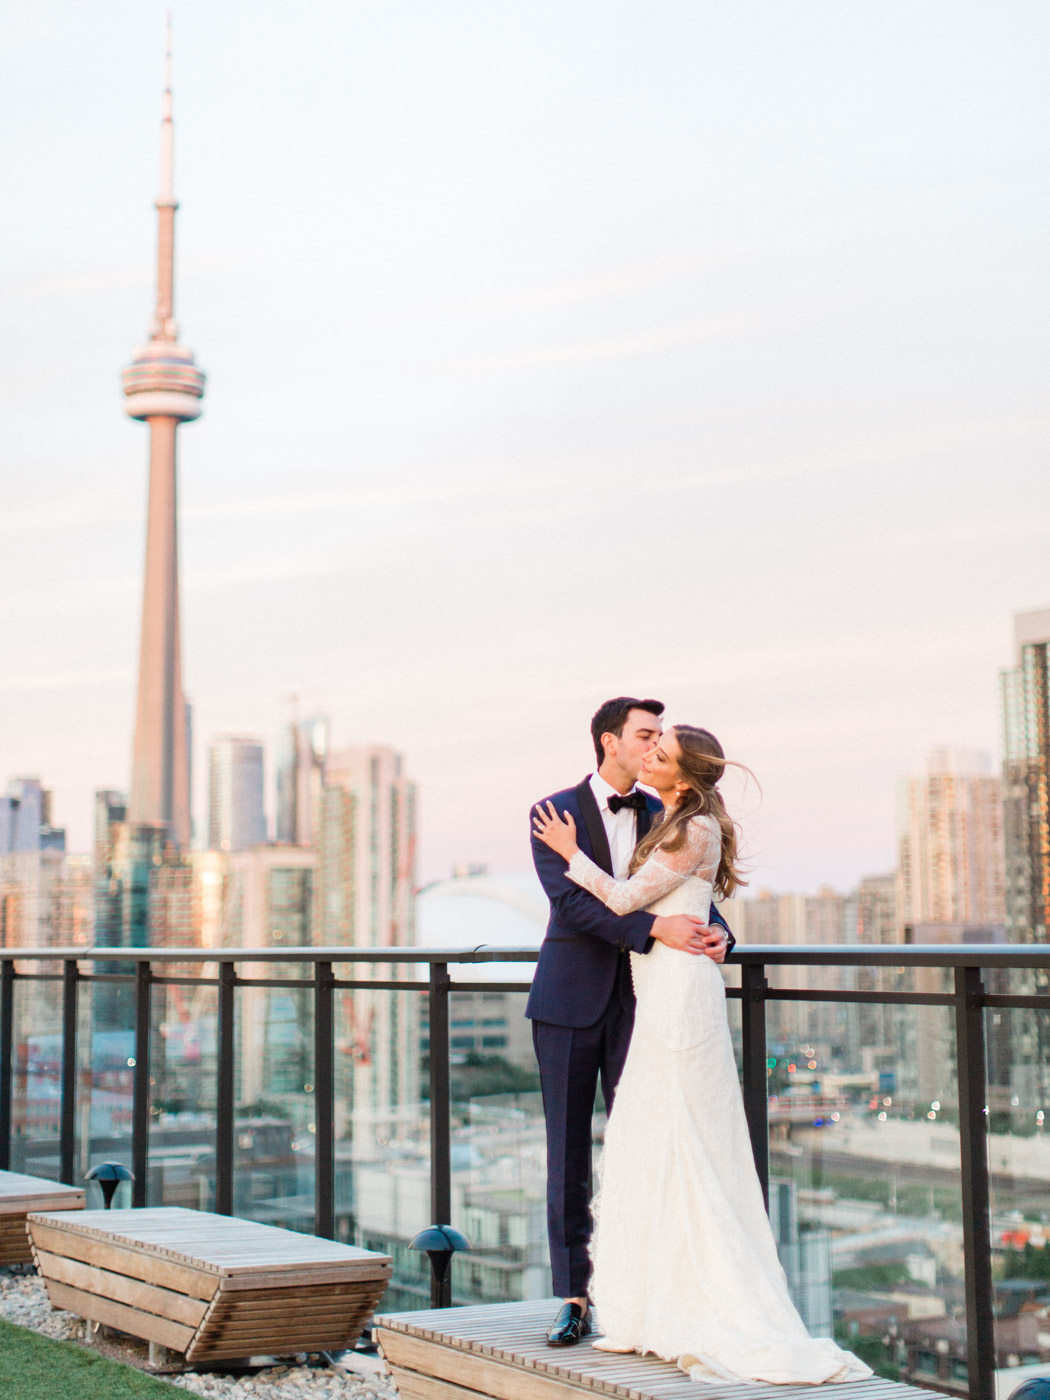 Toronto-Collingwood-Muskoka-Wedding-photographer-how-to-capture-great-couples-photos-on-your-wedding-day1.jpg